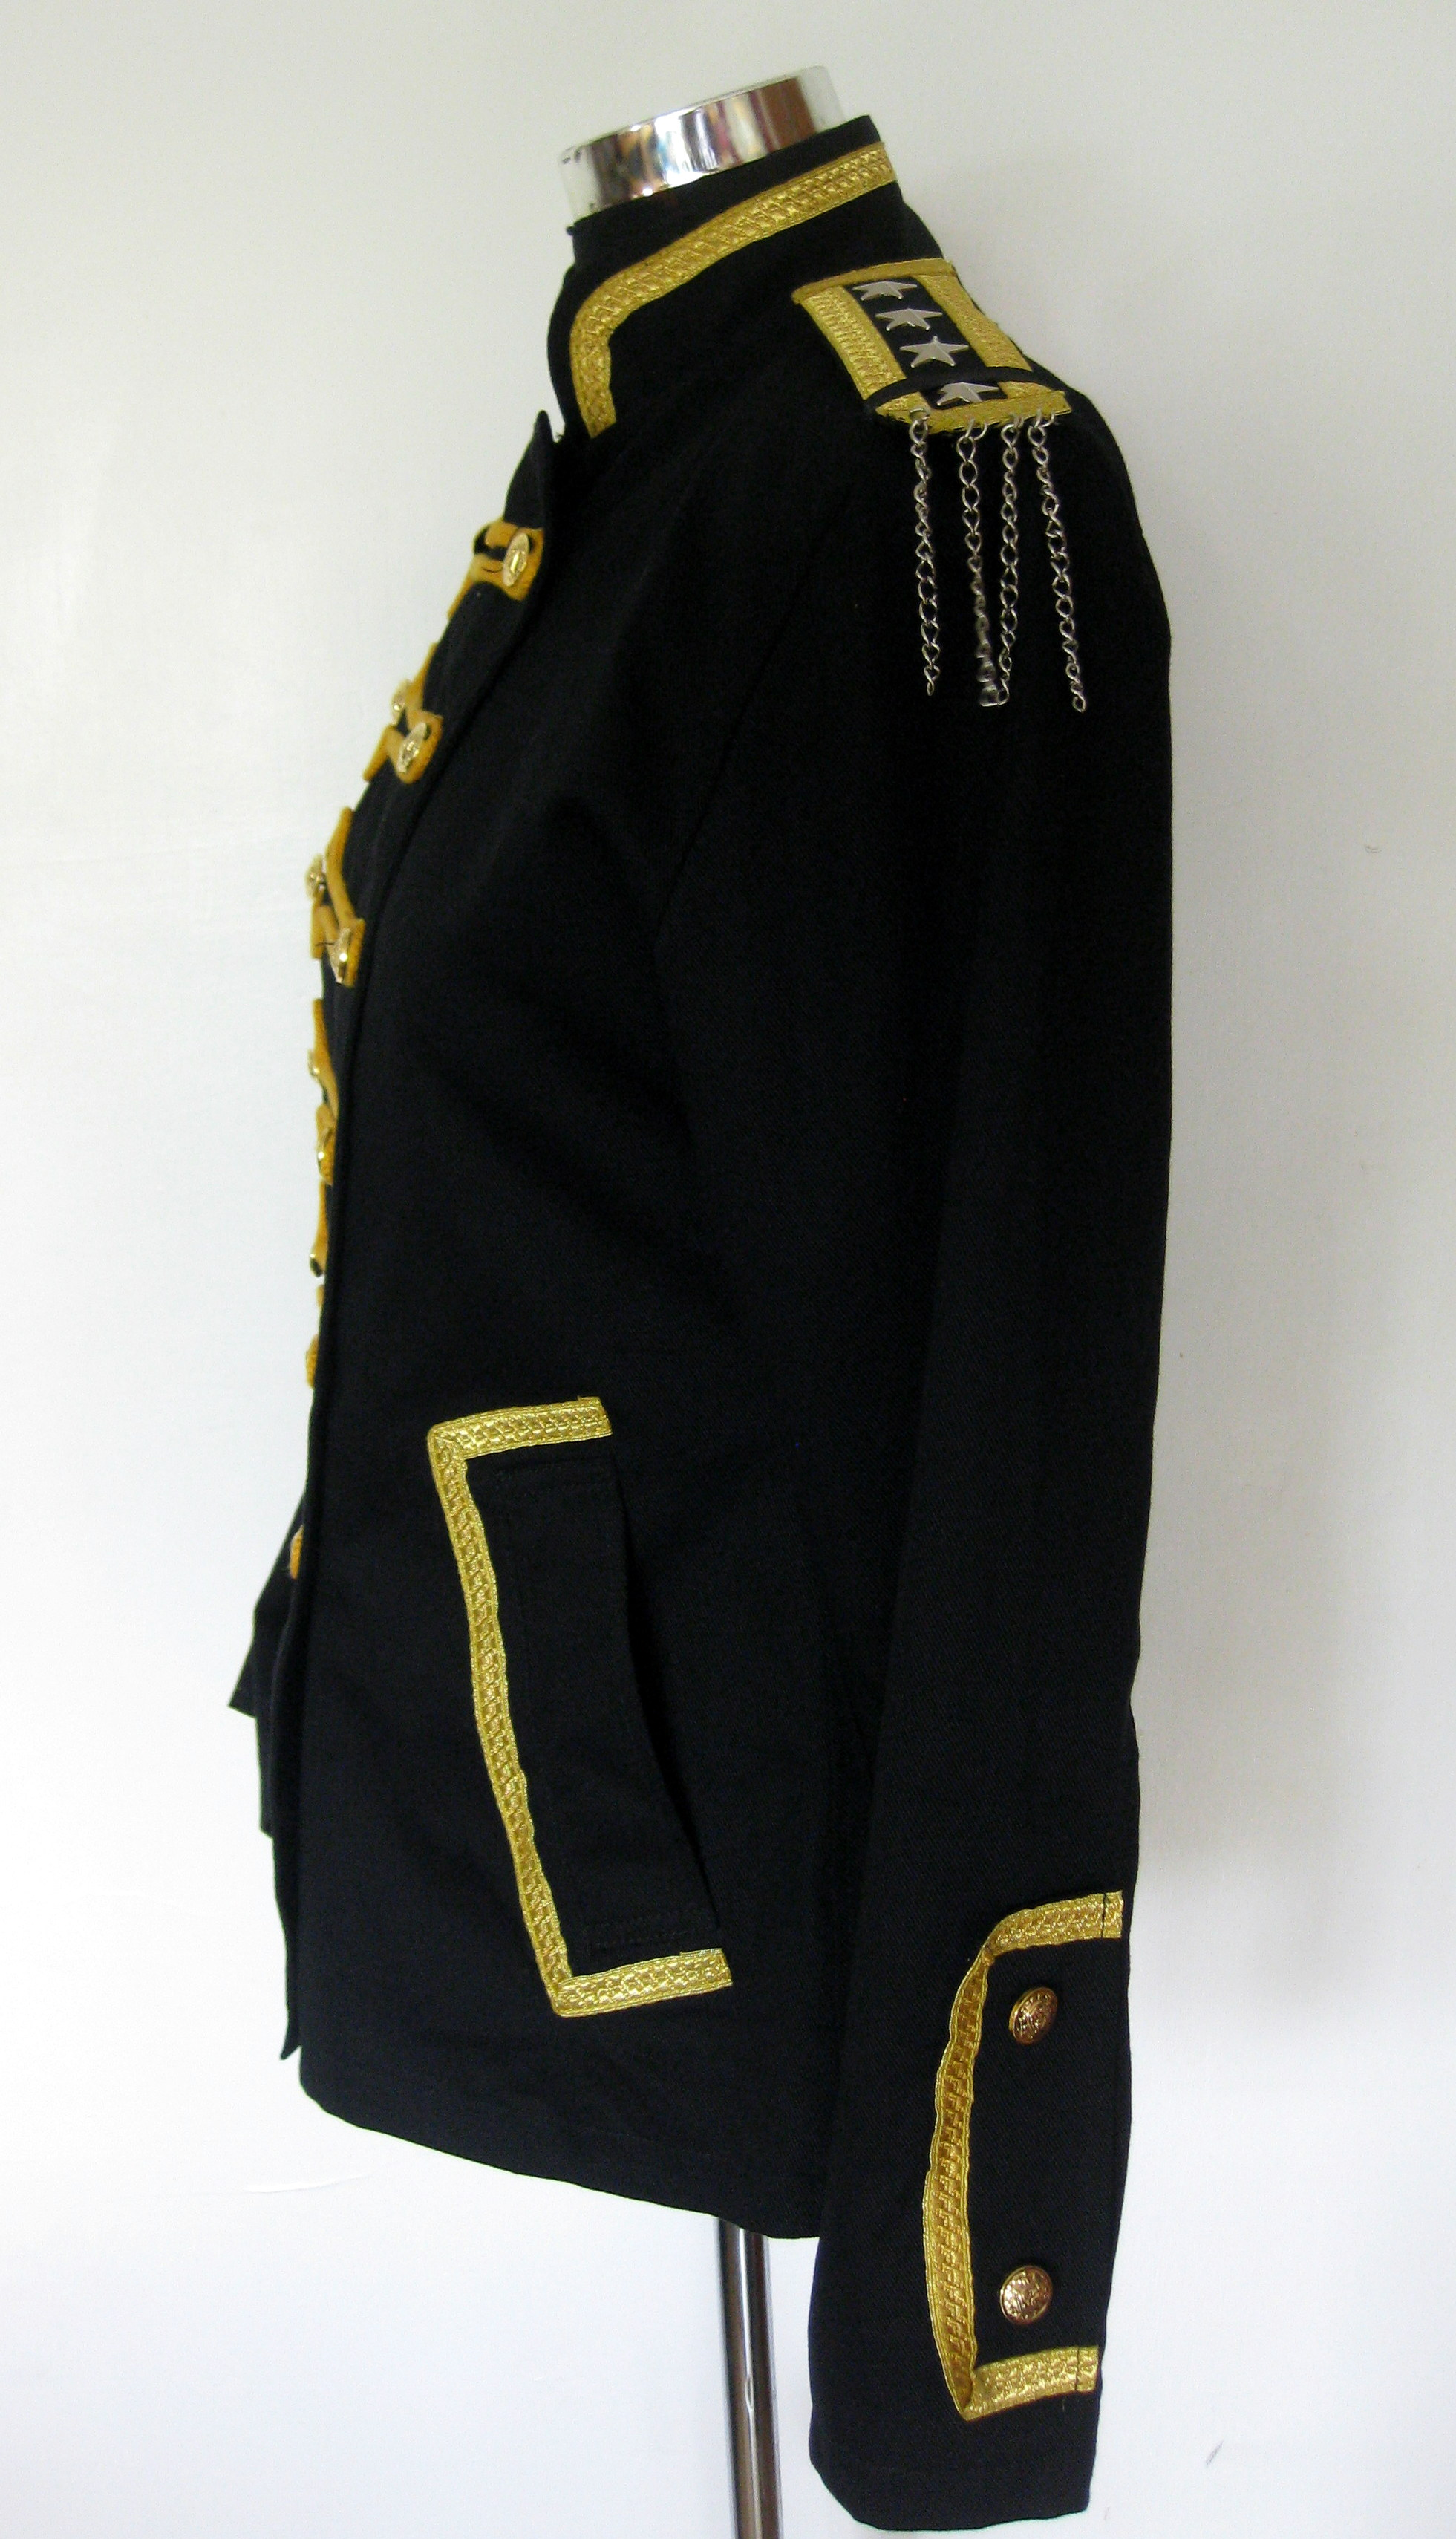 kendall_military_band_style_jacket_jackets_2.JPG